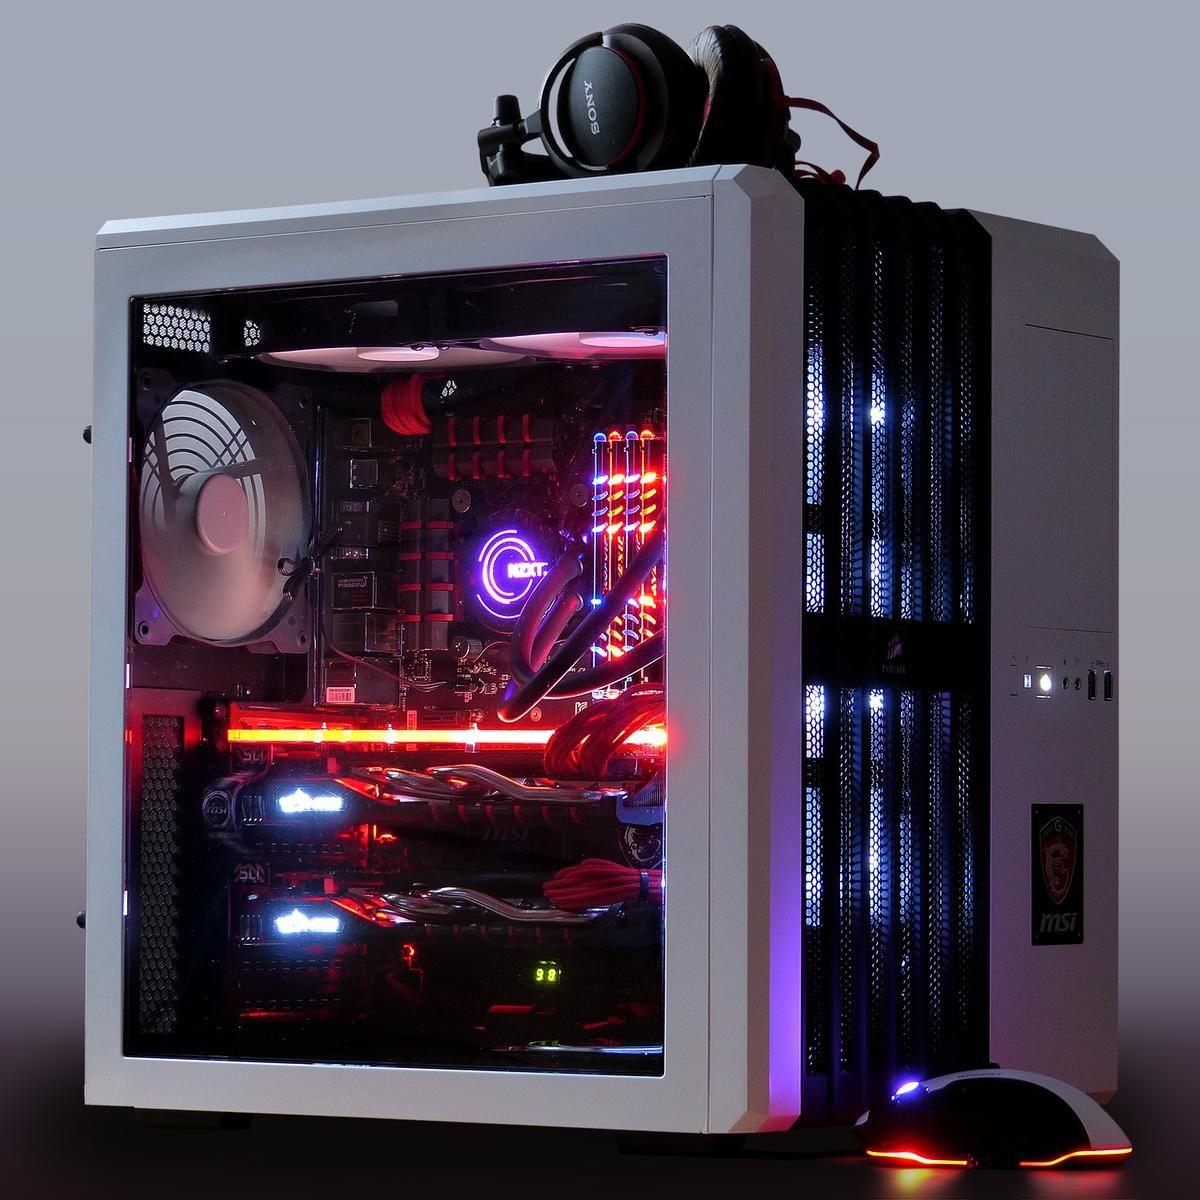 Markill-UK's Completed Build - Intel Core i7-4790K. MSI GeForce GTX 970 (2-Way SLI). Corsair Air 540 | Custom pc. Gaming room setup. Gaming pcs